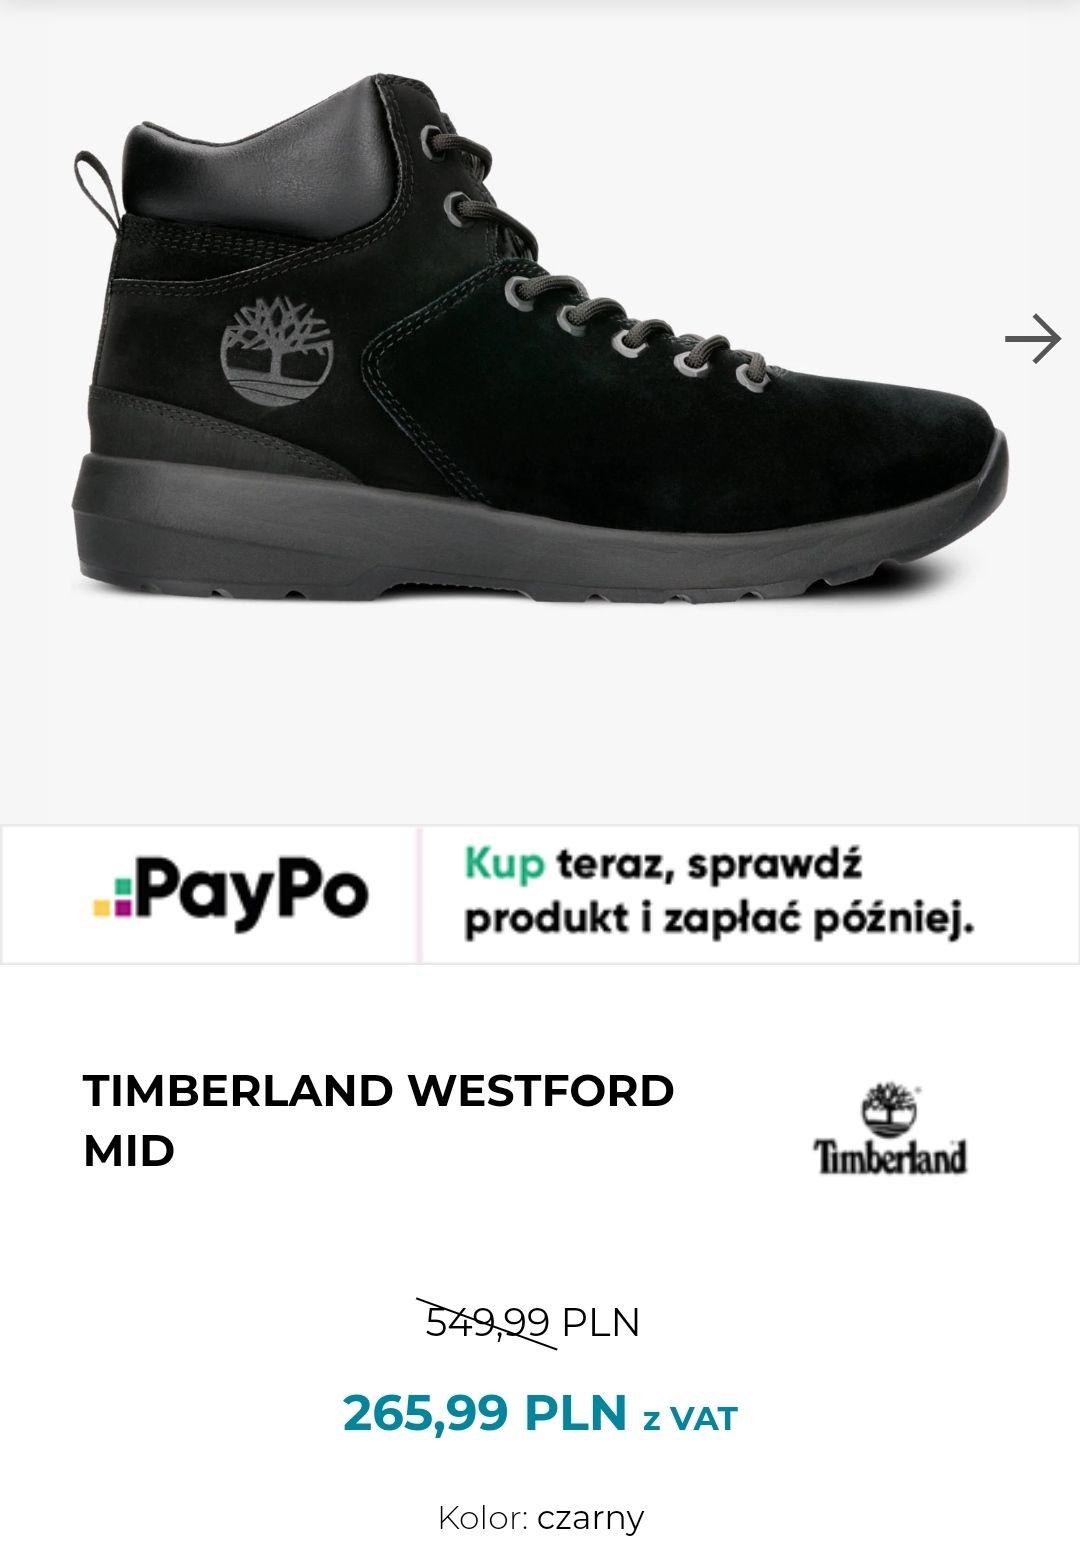 TIMBERLAND WESTFORD MID